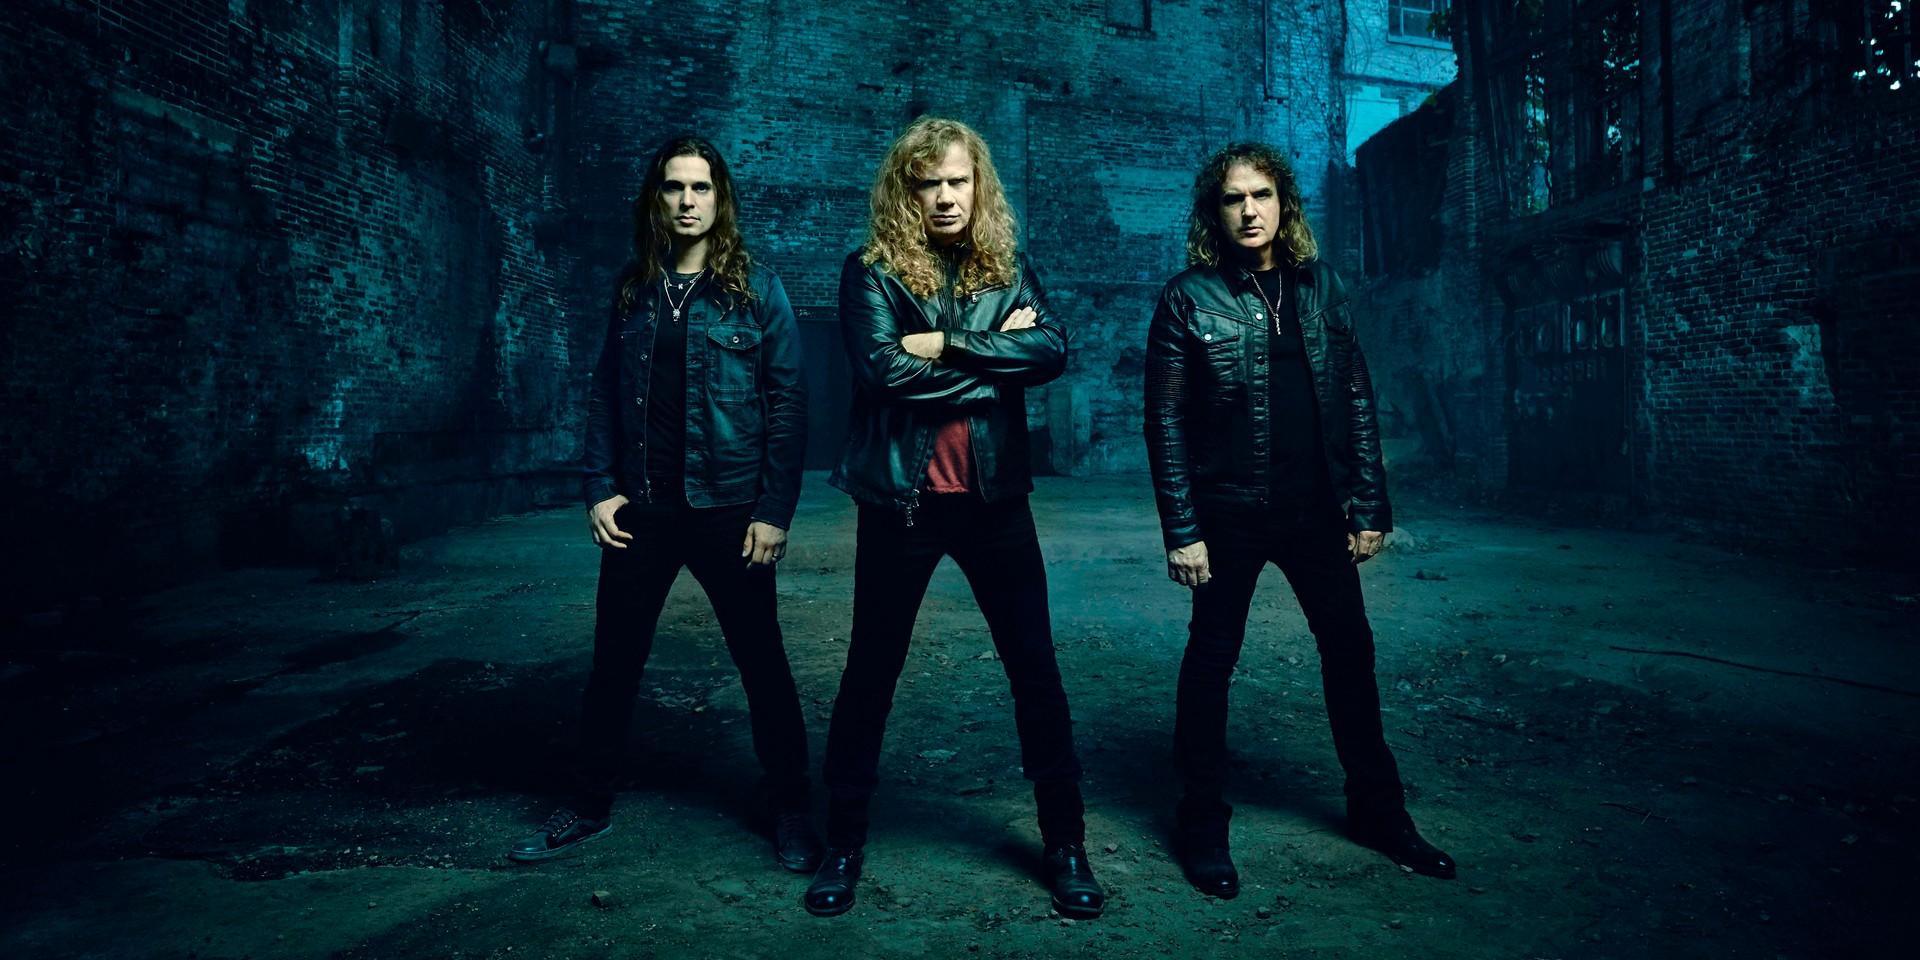 Thrash metal pioneers Megadeth brings their Dystopia World Tour to Singapore